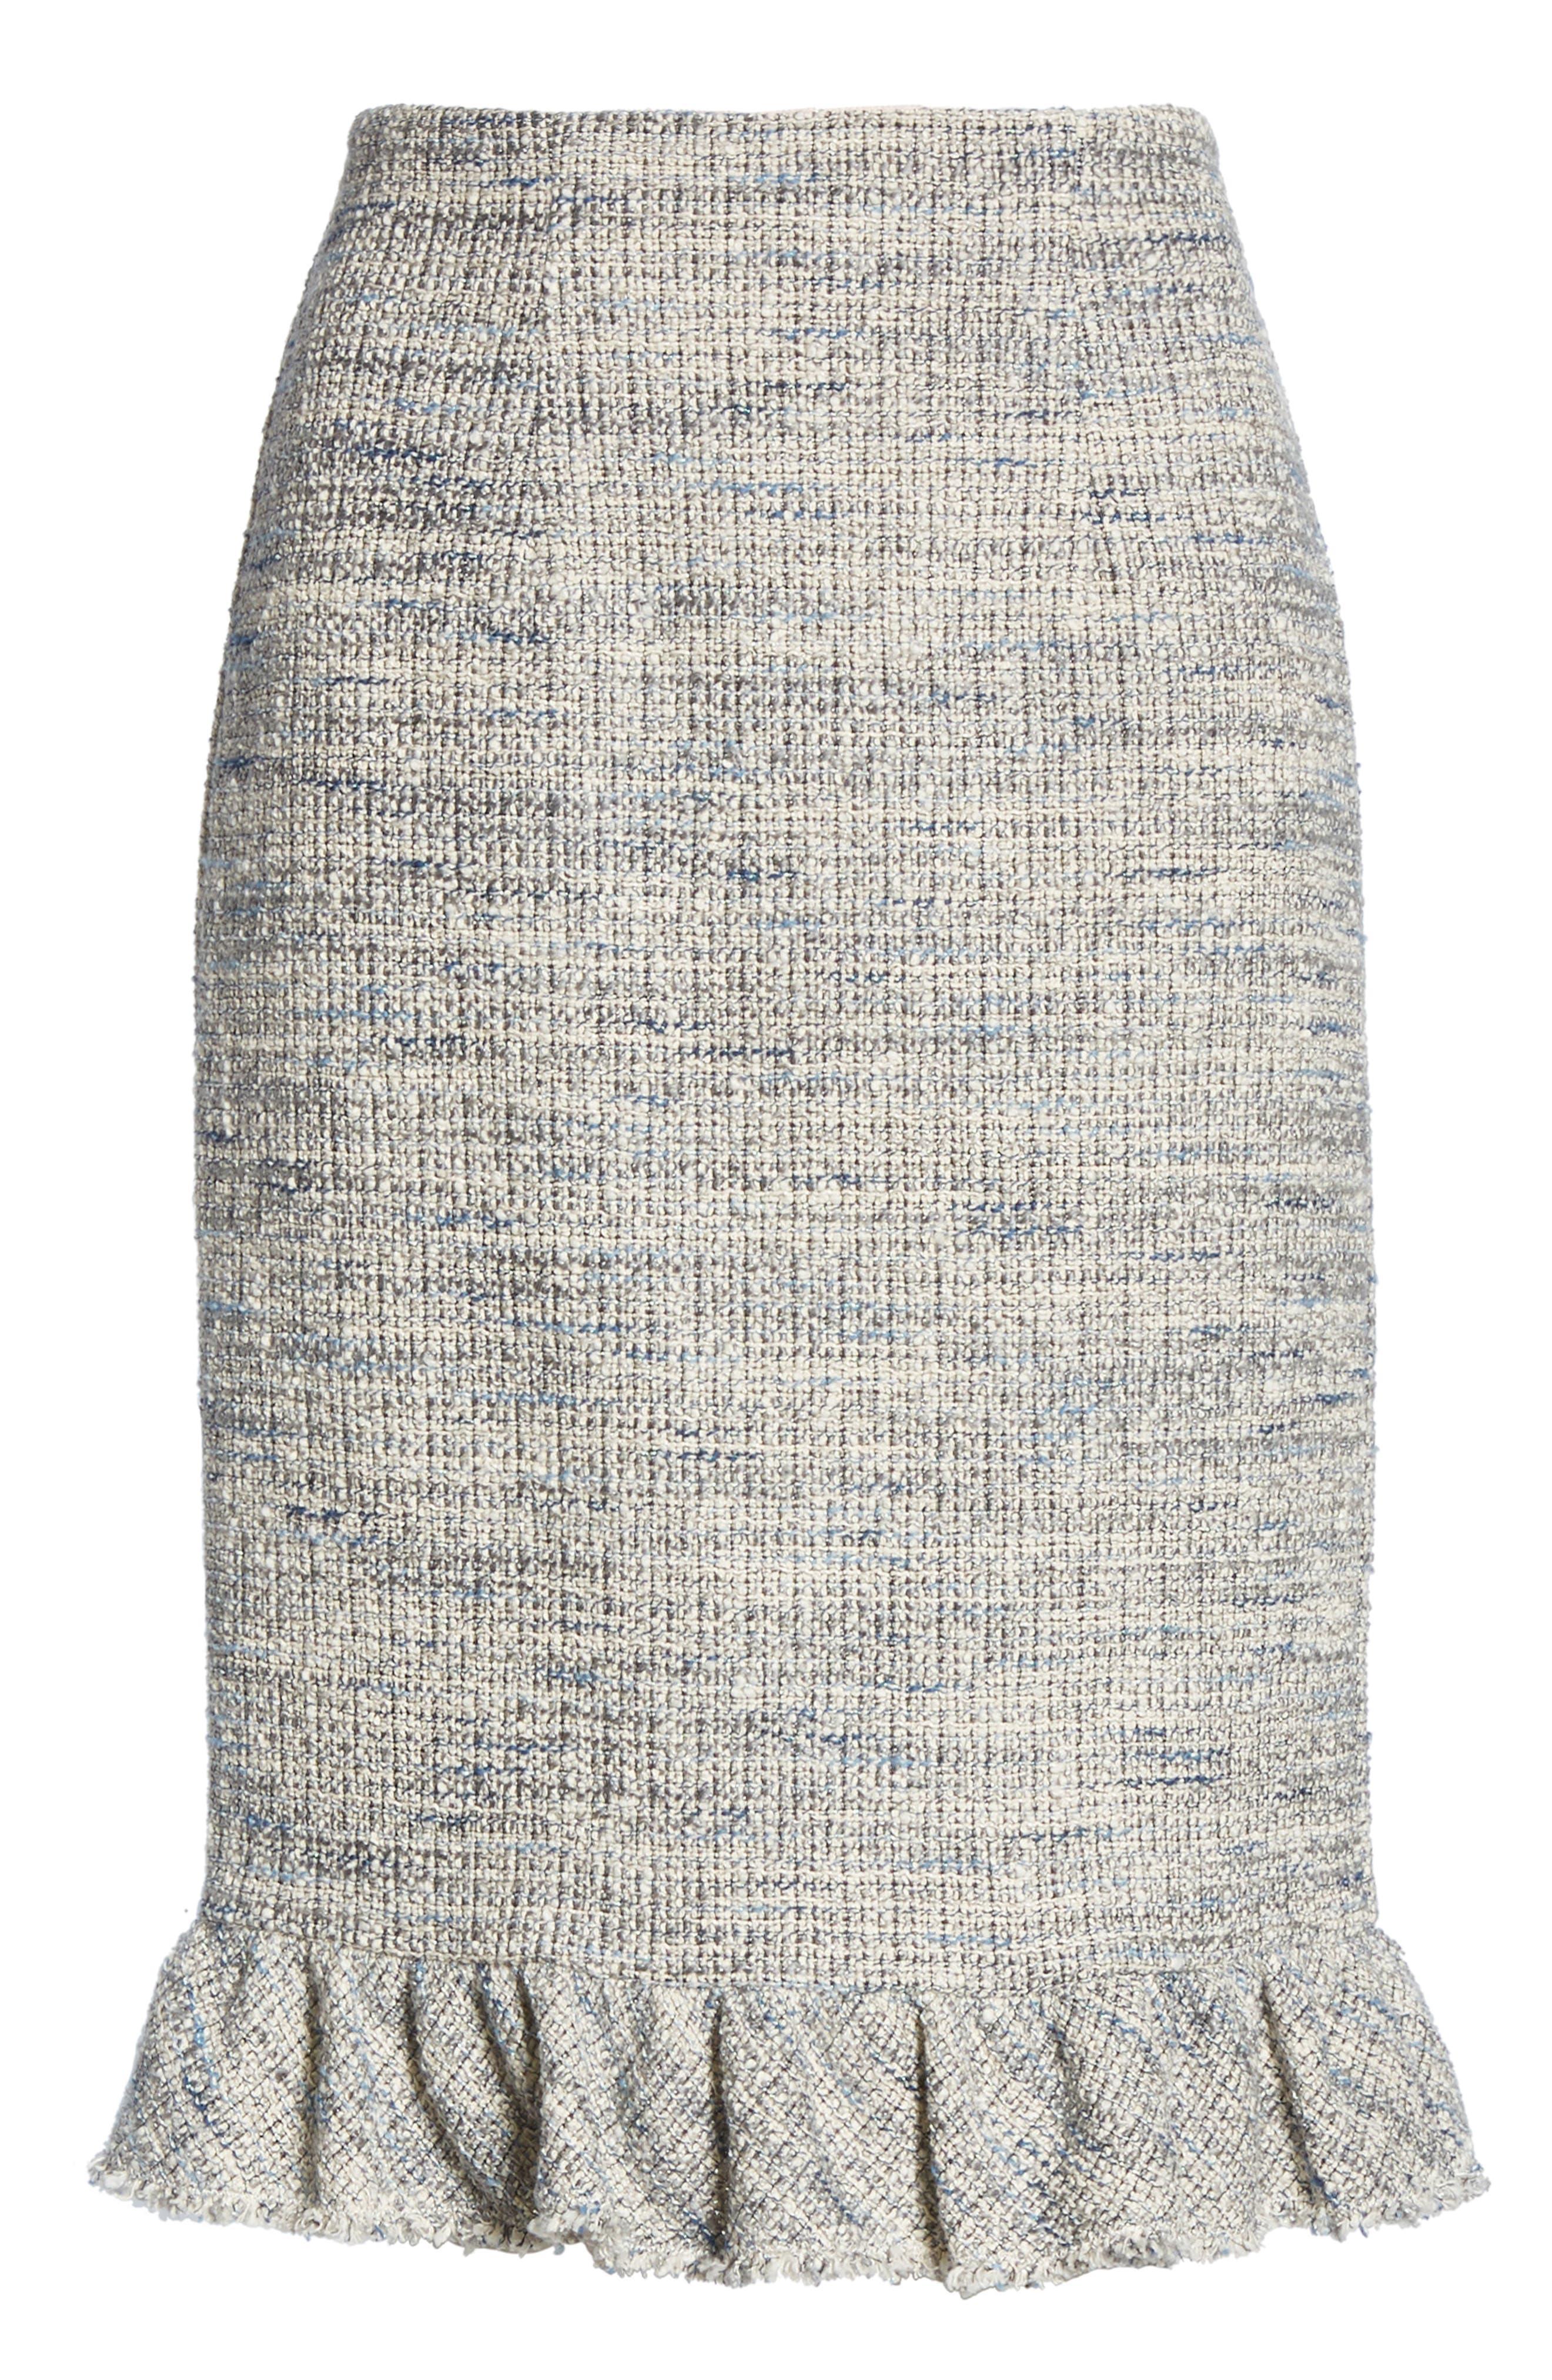 REBECCA TAYLOR, Tweed Ruffle Hem Skirt, Alternate thumbnail 6, color, 020